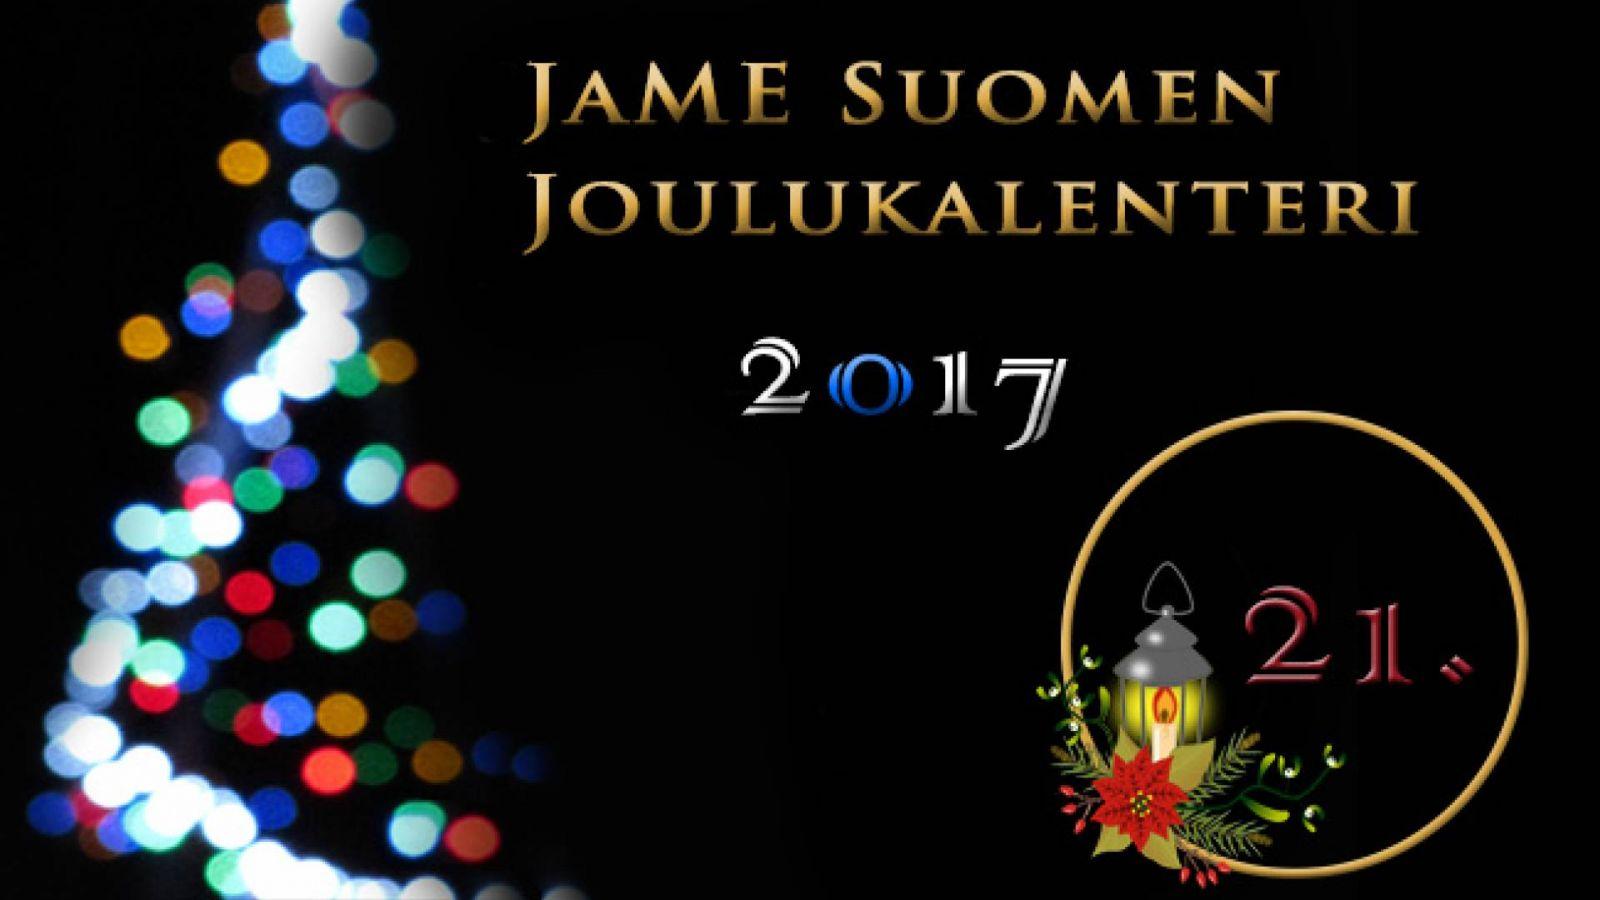 JaME Suomen joulukalenterin 21. luukku © Nipsu